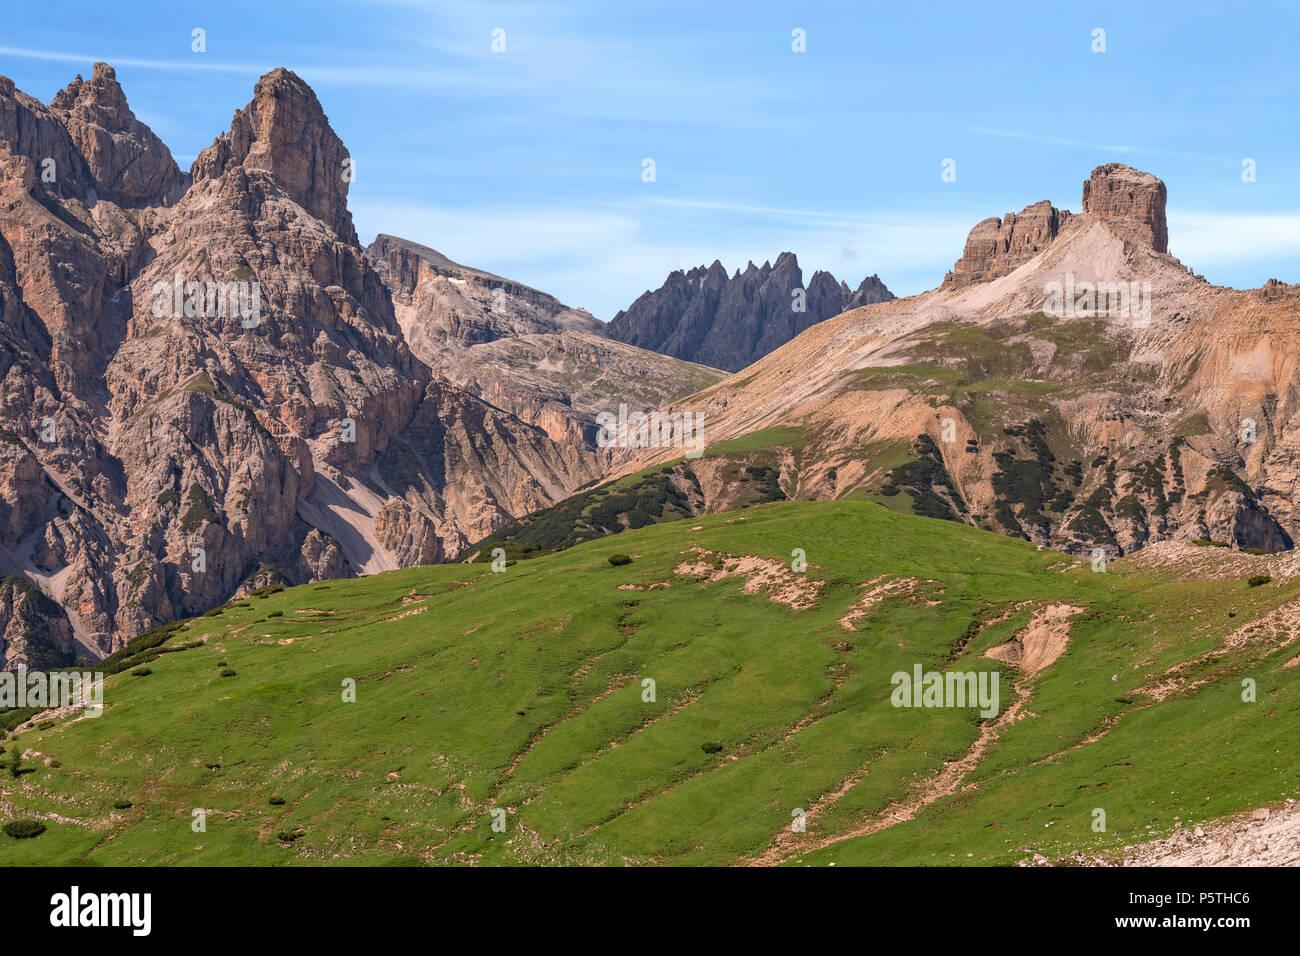 torre dei scarperi, Dolomites, Veneto, Belluno, Sexten, Italy, Europe - Stock Image